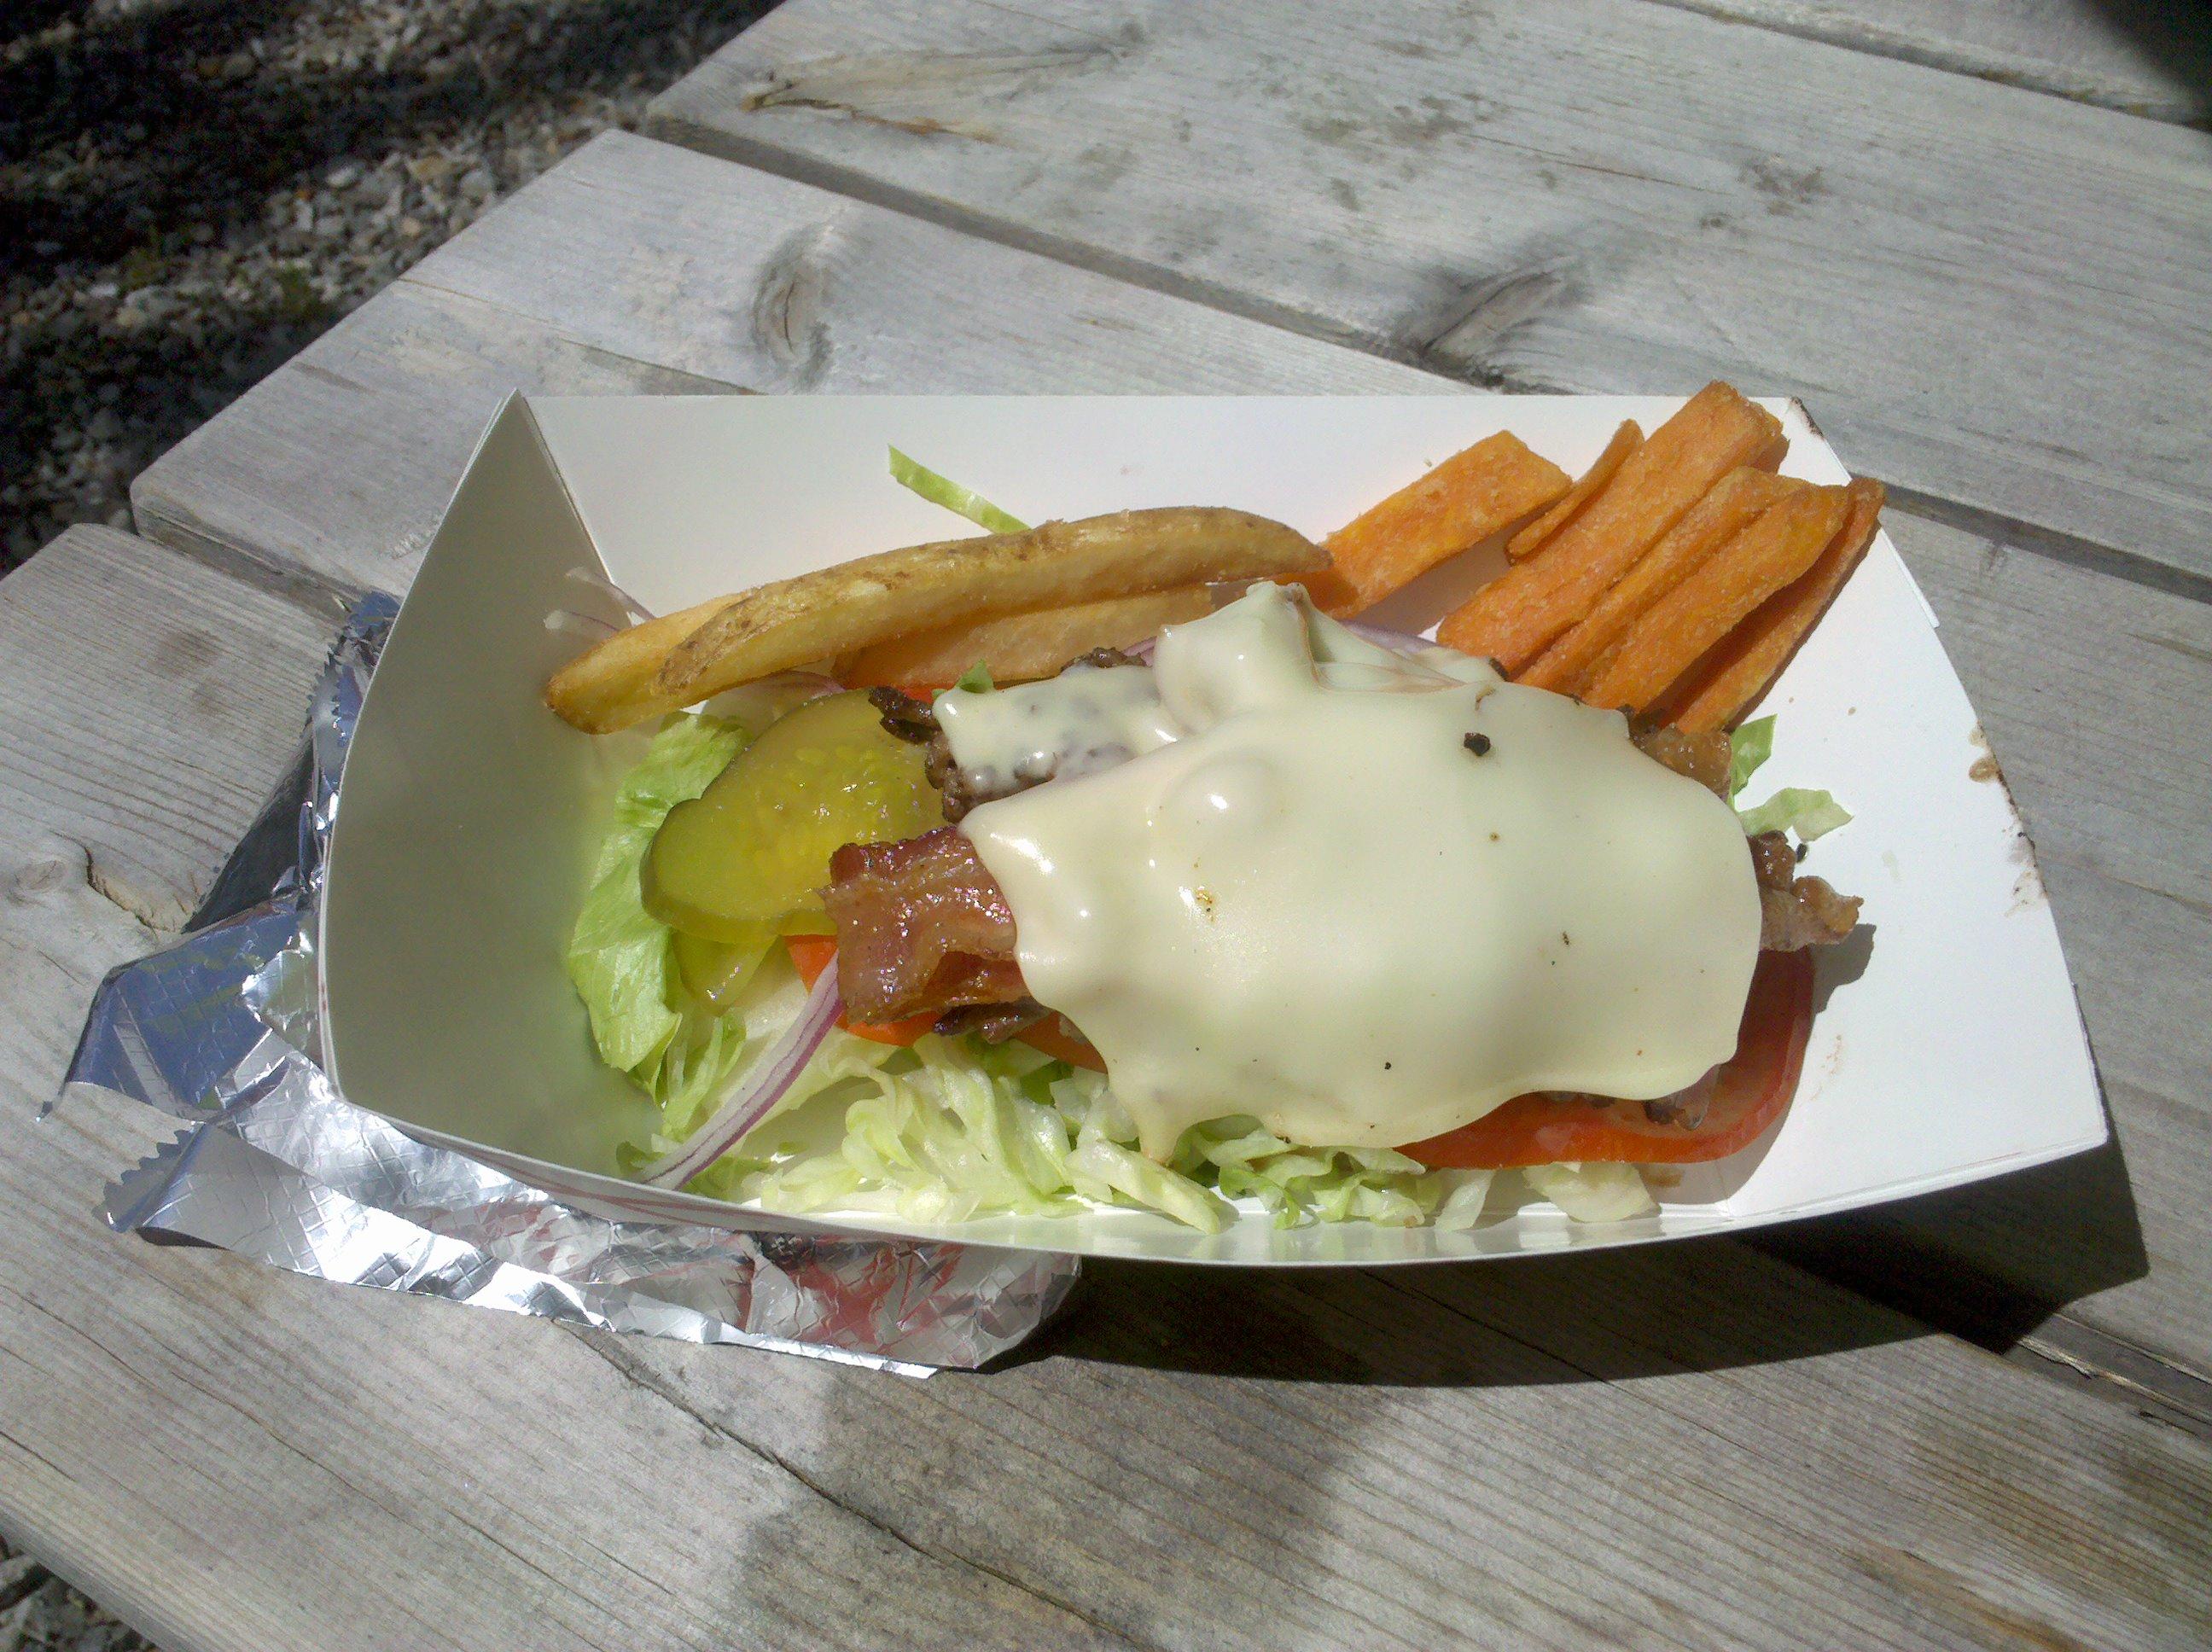 PAPA JOE'S HUMBLE KITCHEN :: GF Bacon Cheese Burger with Fries